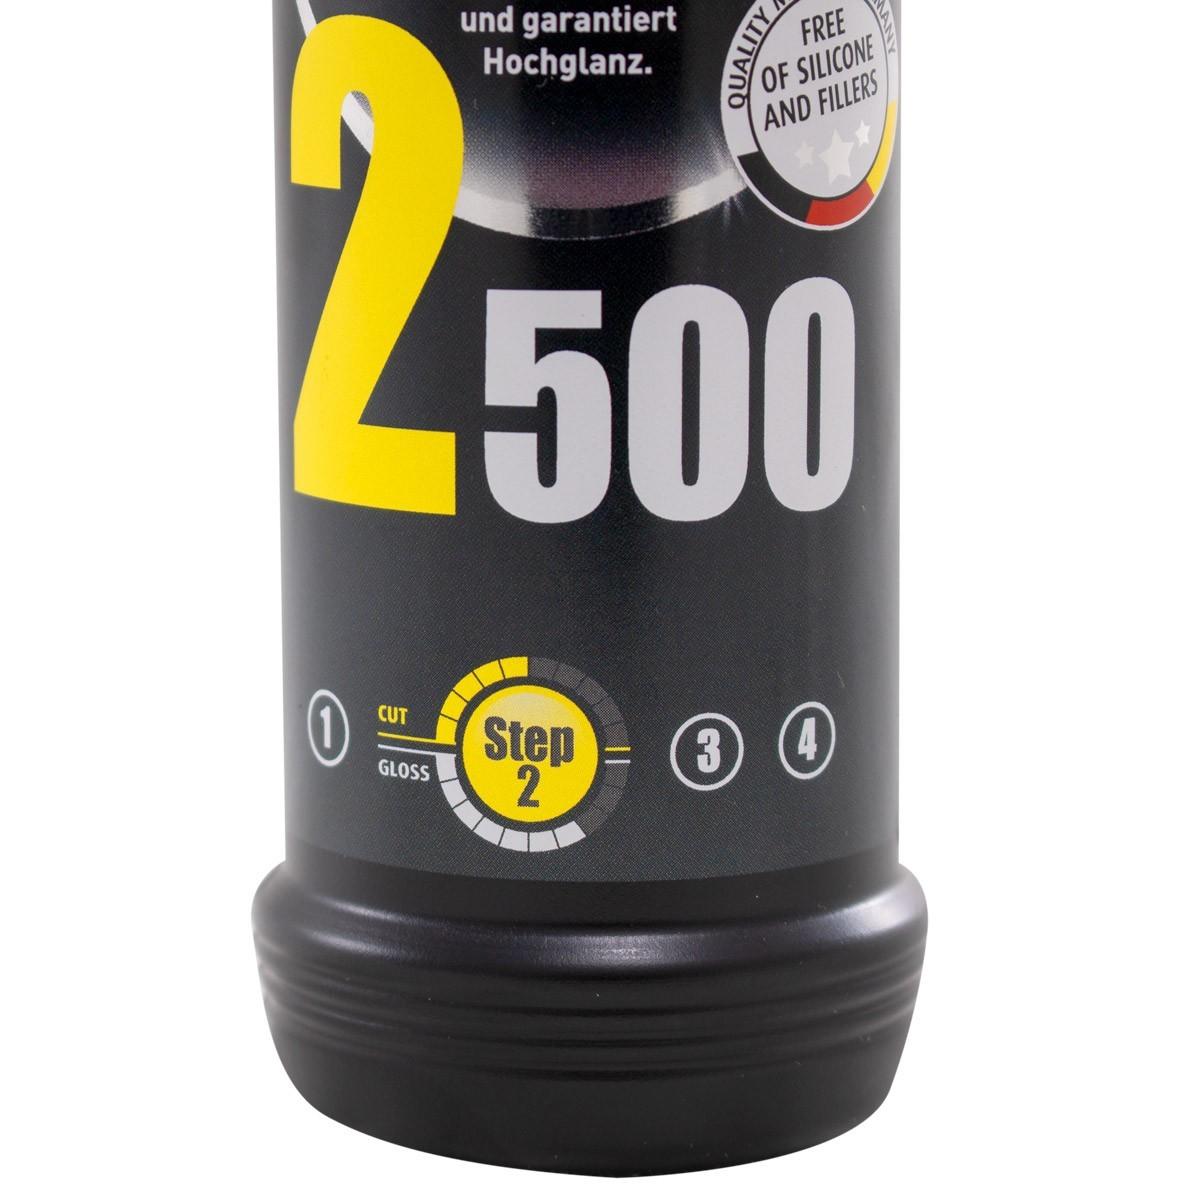 KIT DE POLIMENTO PROFISSIONAL MENZERNA 400 / 2500 / 3800 / POWER LOCK